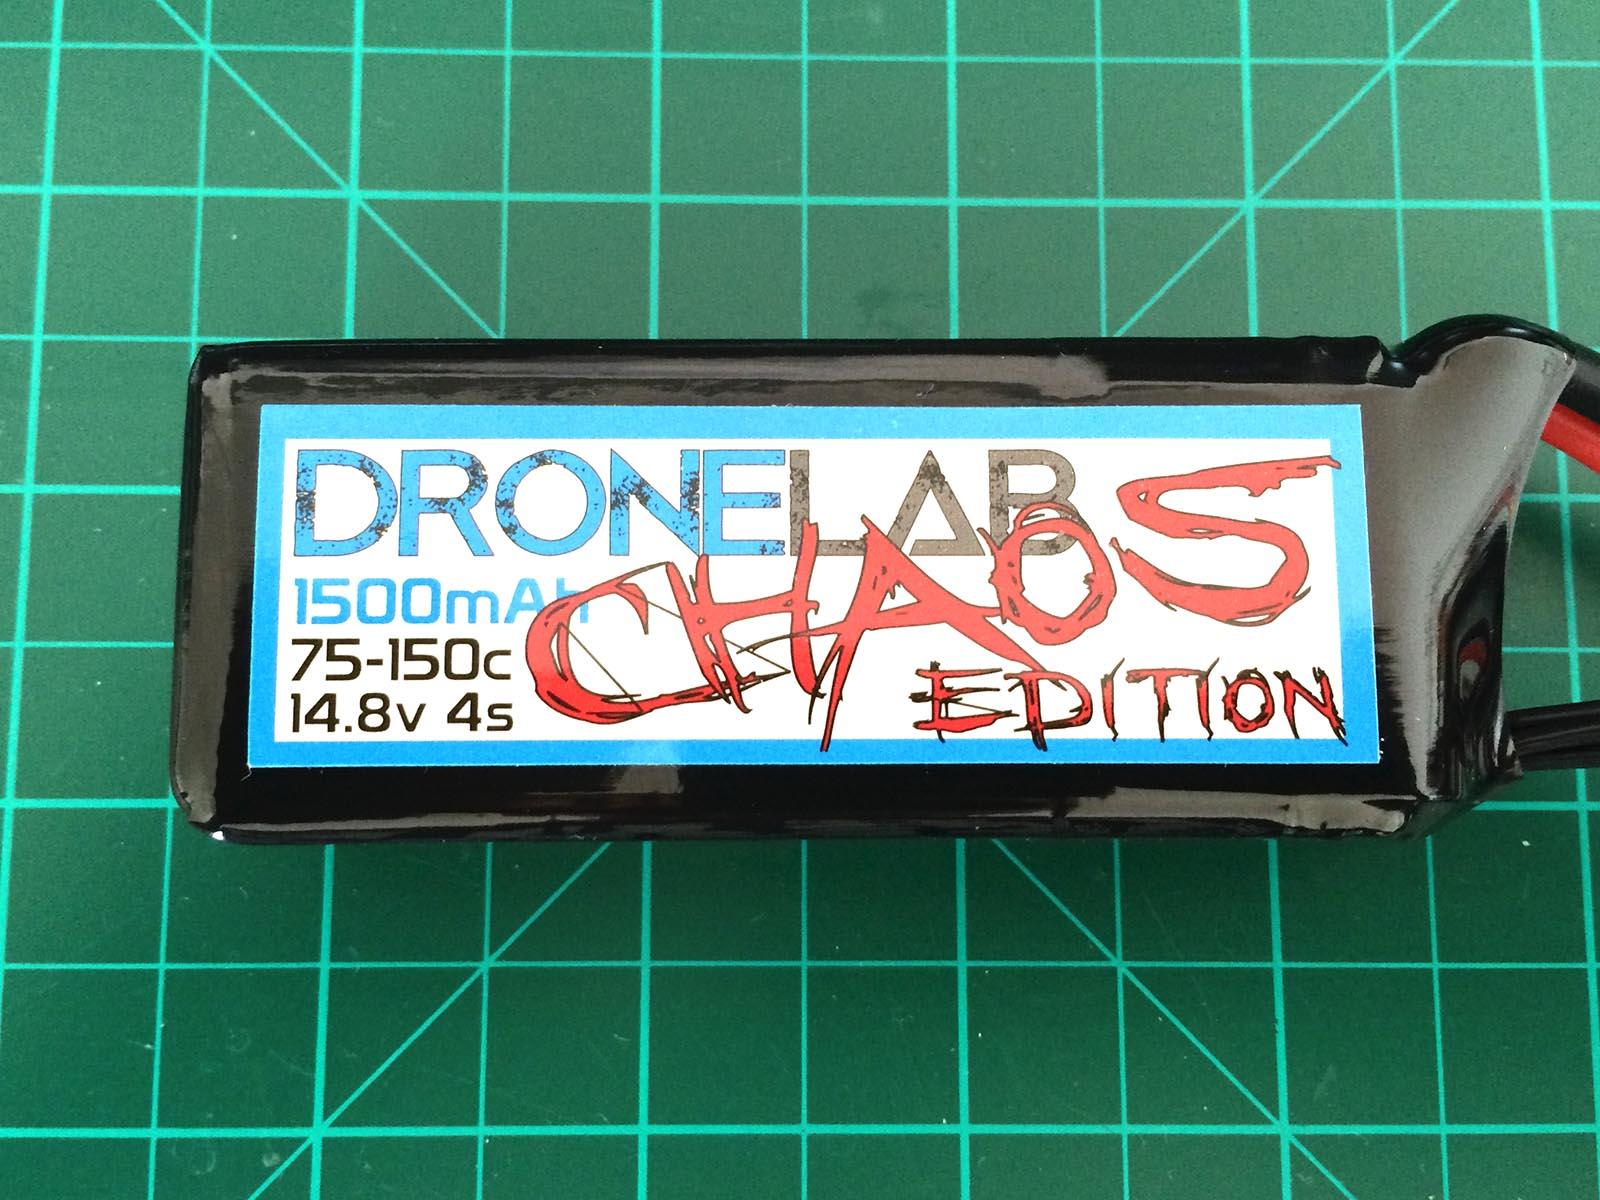 DroneLab CHAOS Edition 4S 1500 mAh 75-150 C - Front